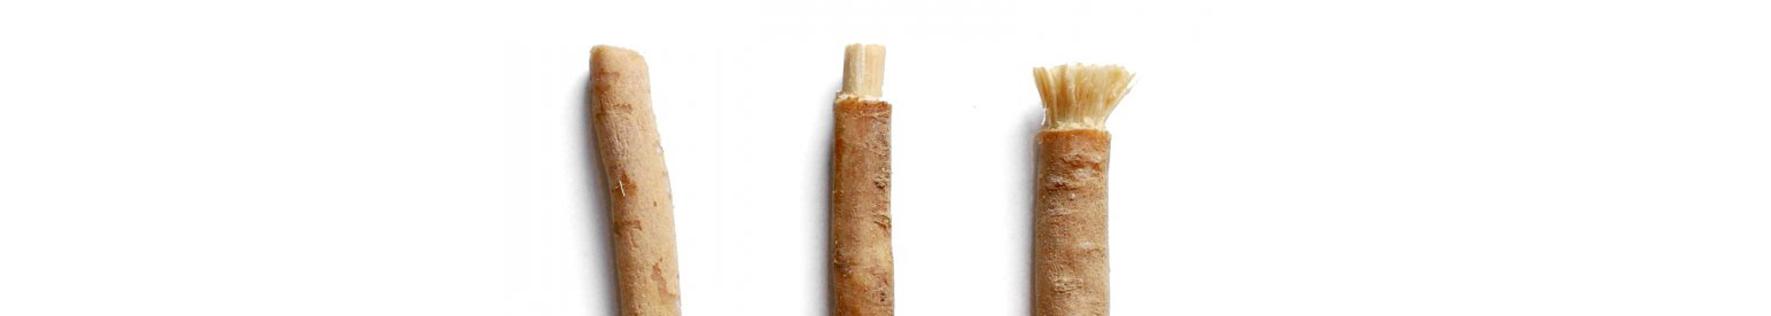 yoni-prirodni-zubni-kartacek-miswak-samostatny